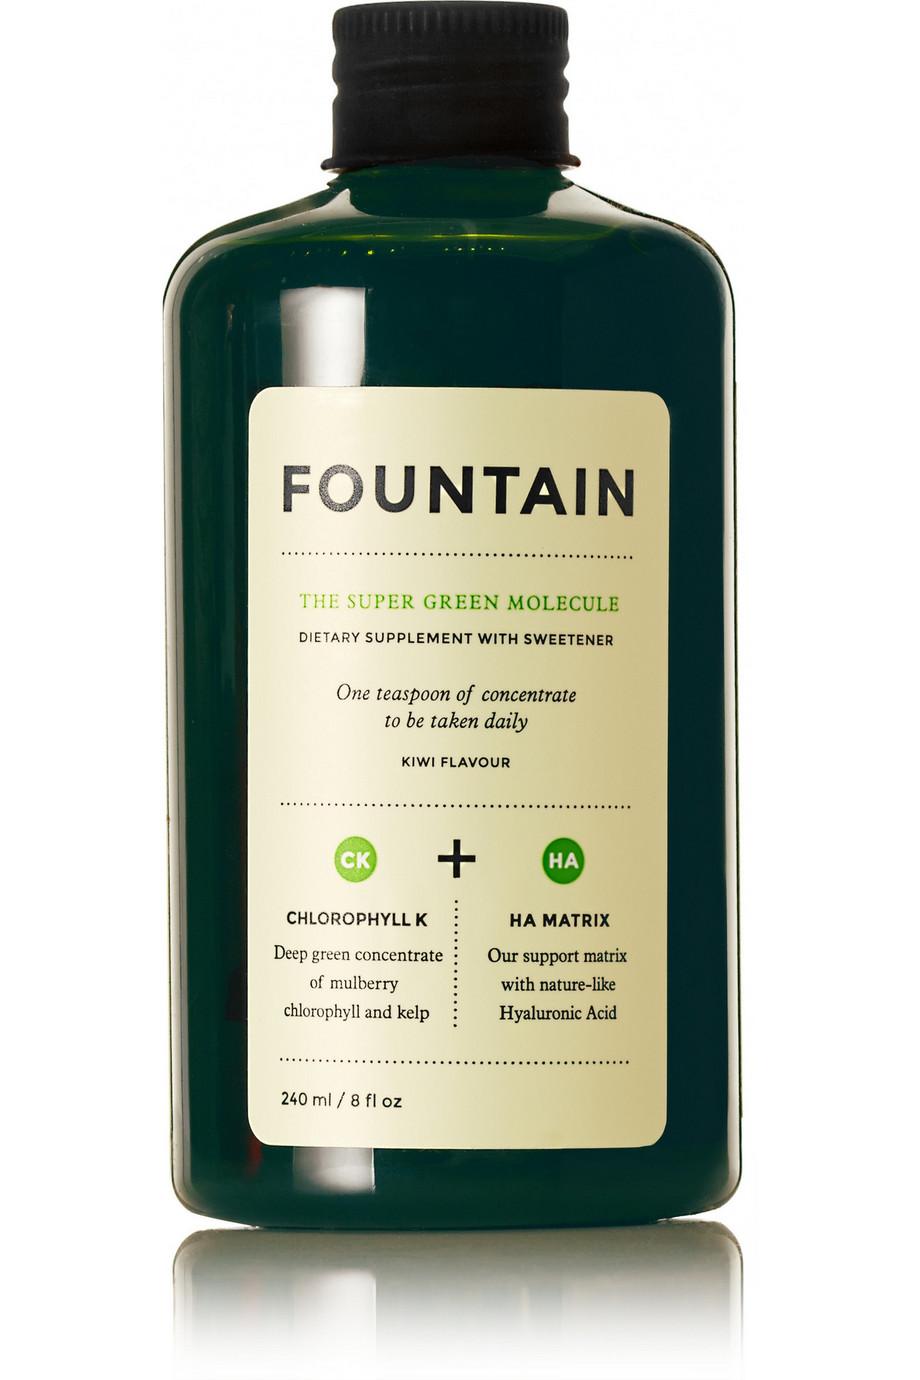 Fountain The Super Green Molecule, 240ml